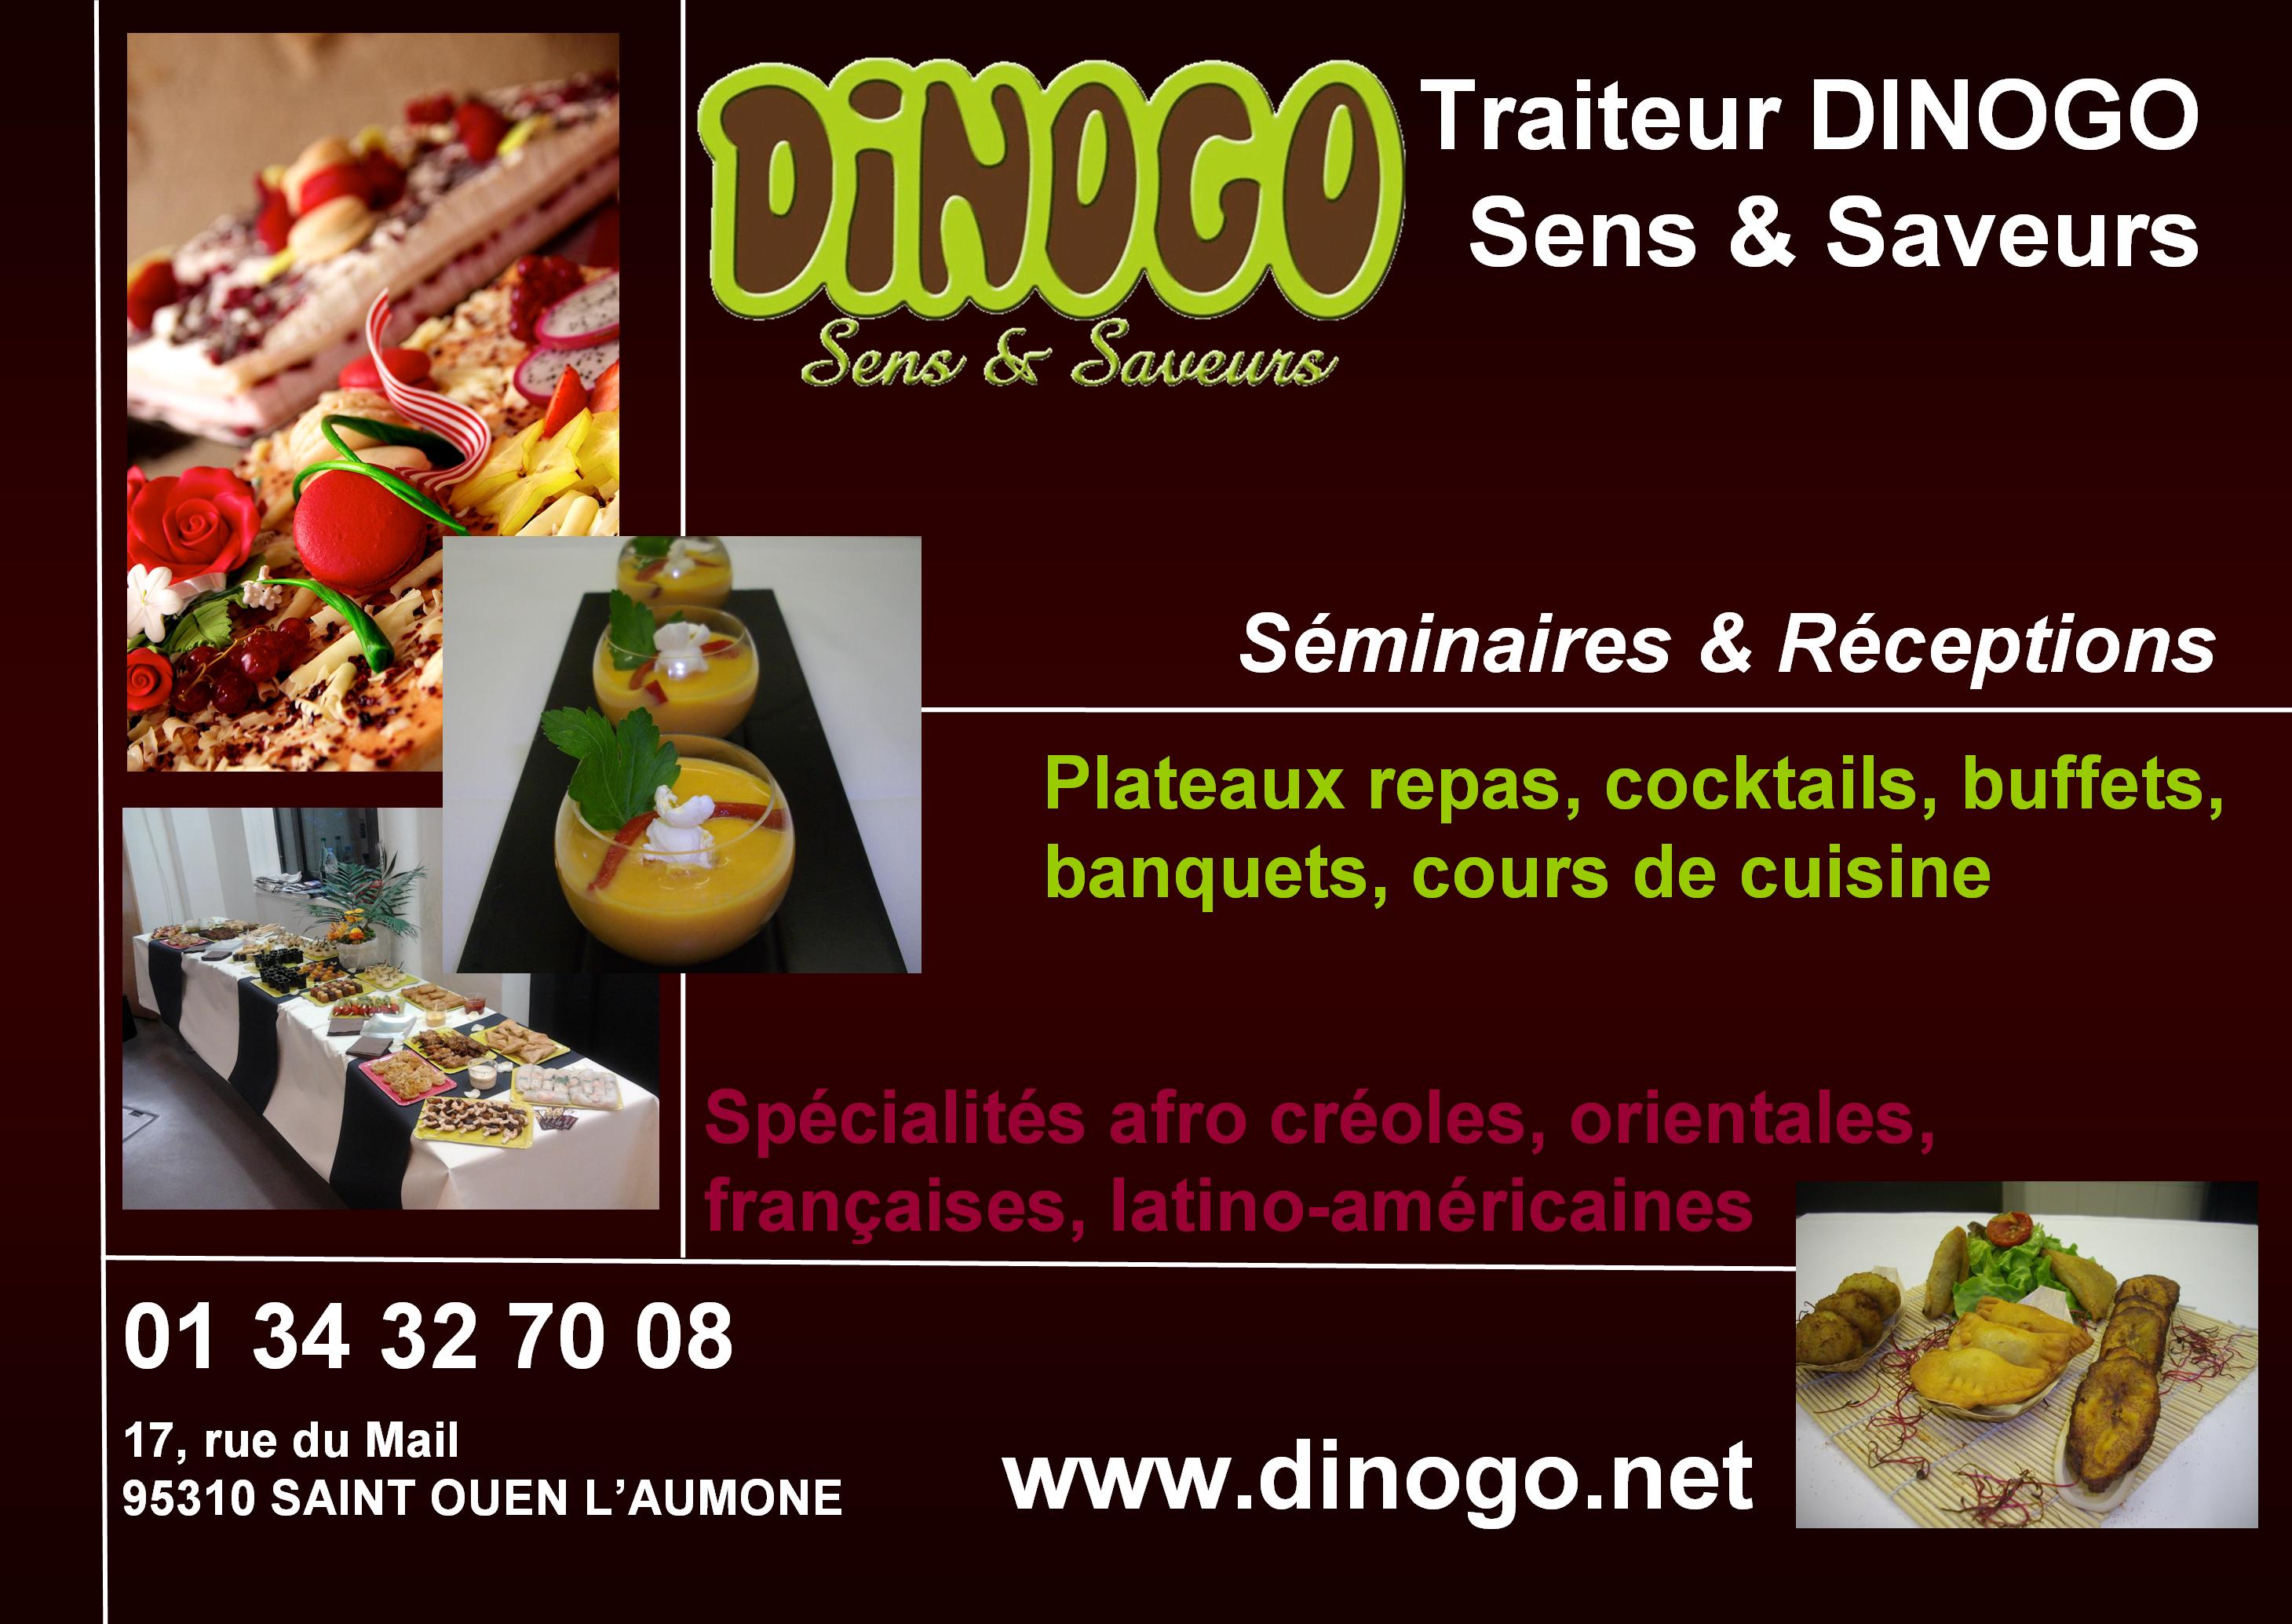 Traiteur DINOGO – Sens & Saveurs